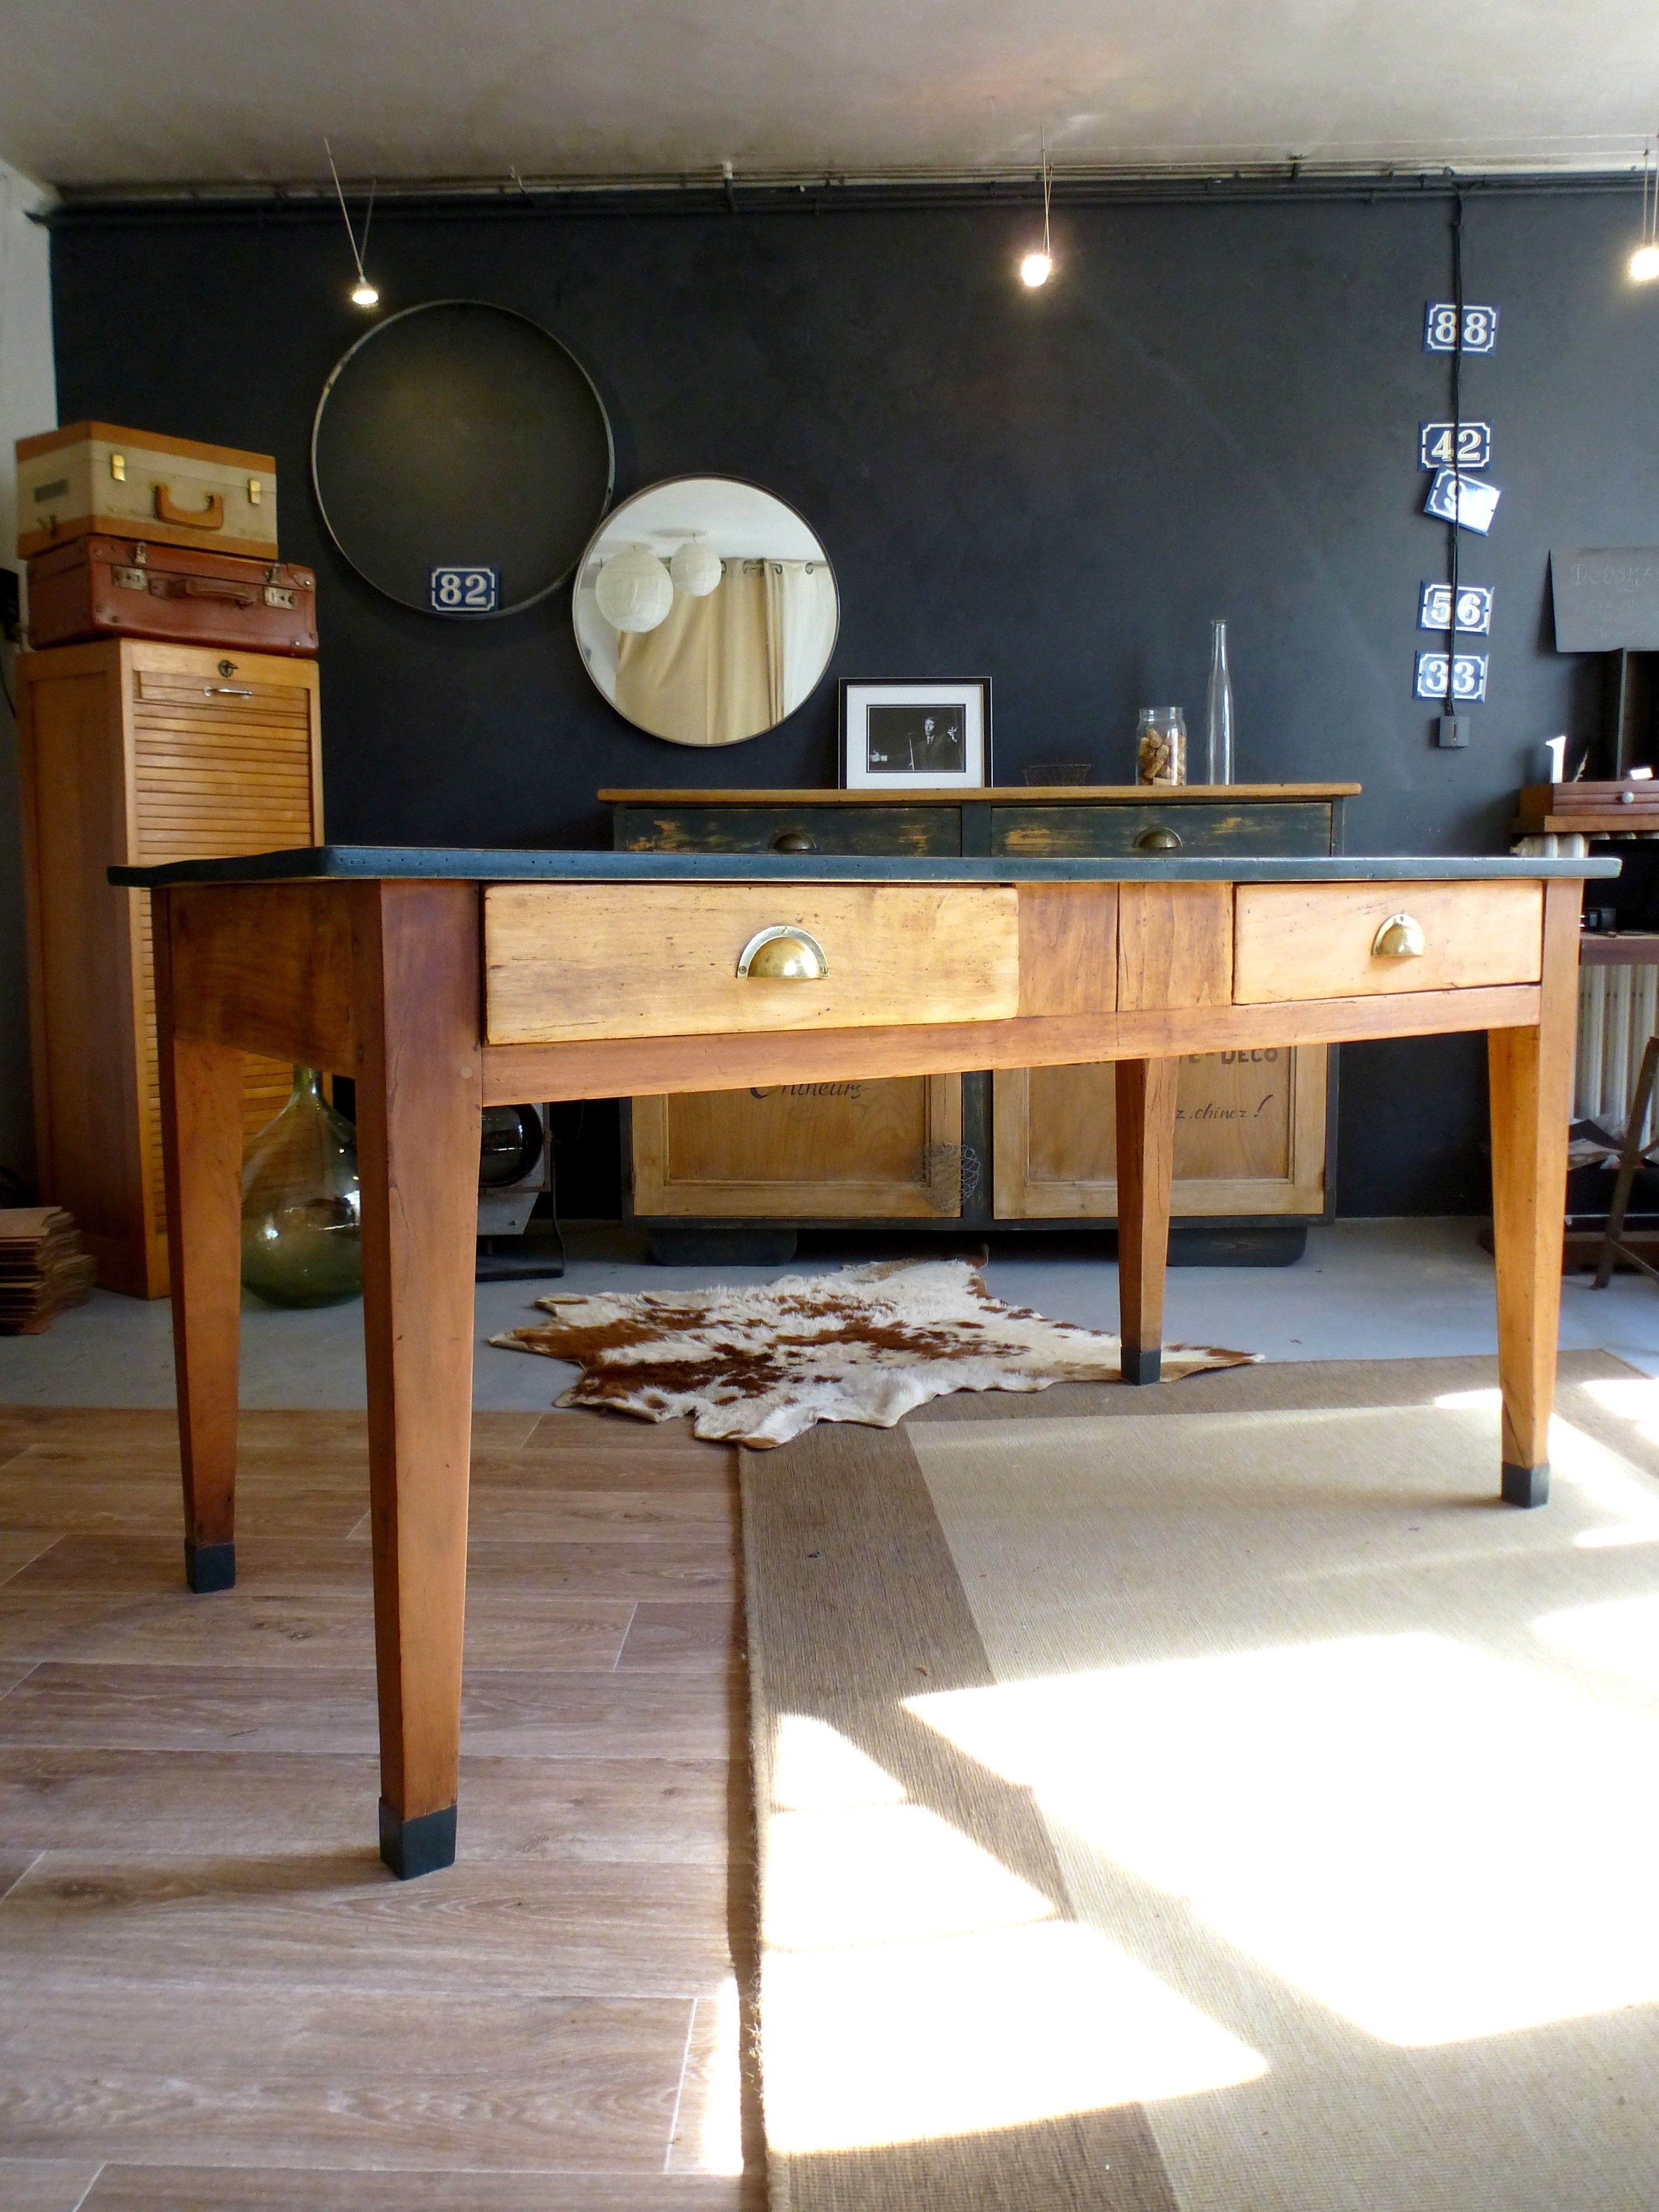 81fb4e13a176d8a6bac33c373641c927 Impressionnant De Table Basse originale Concept